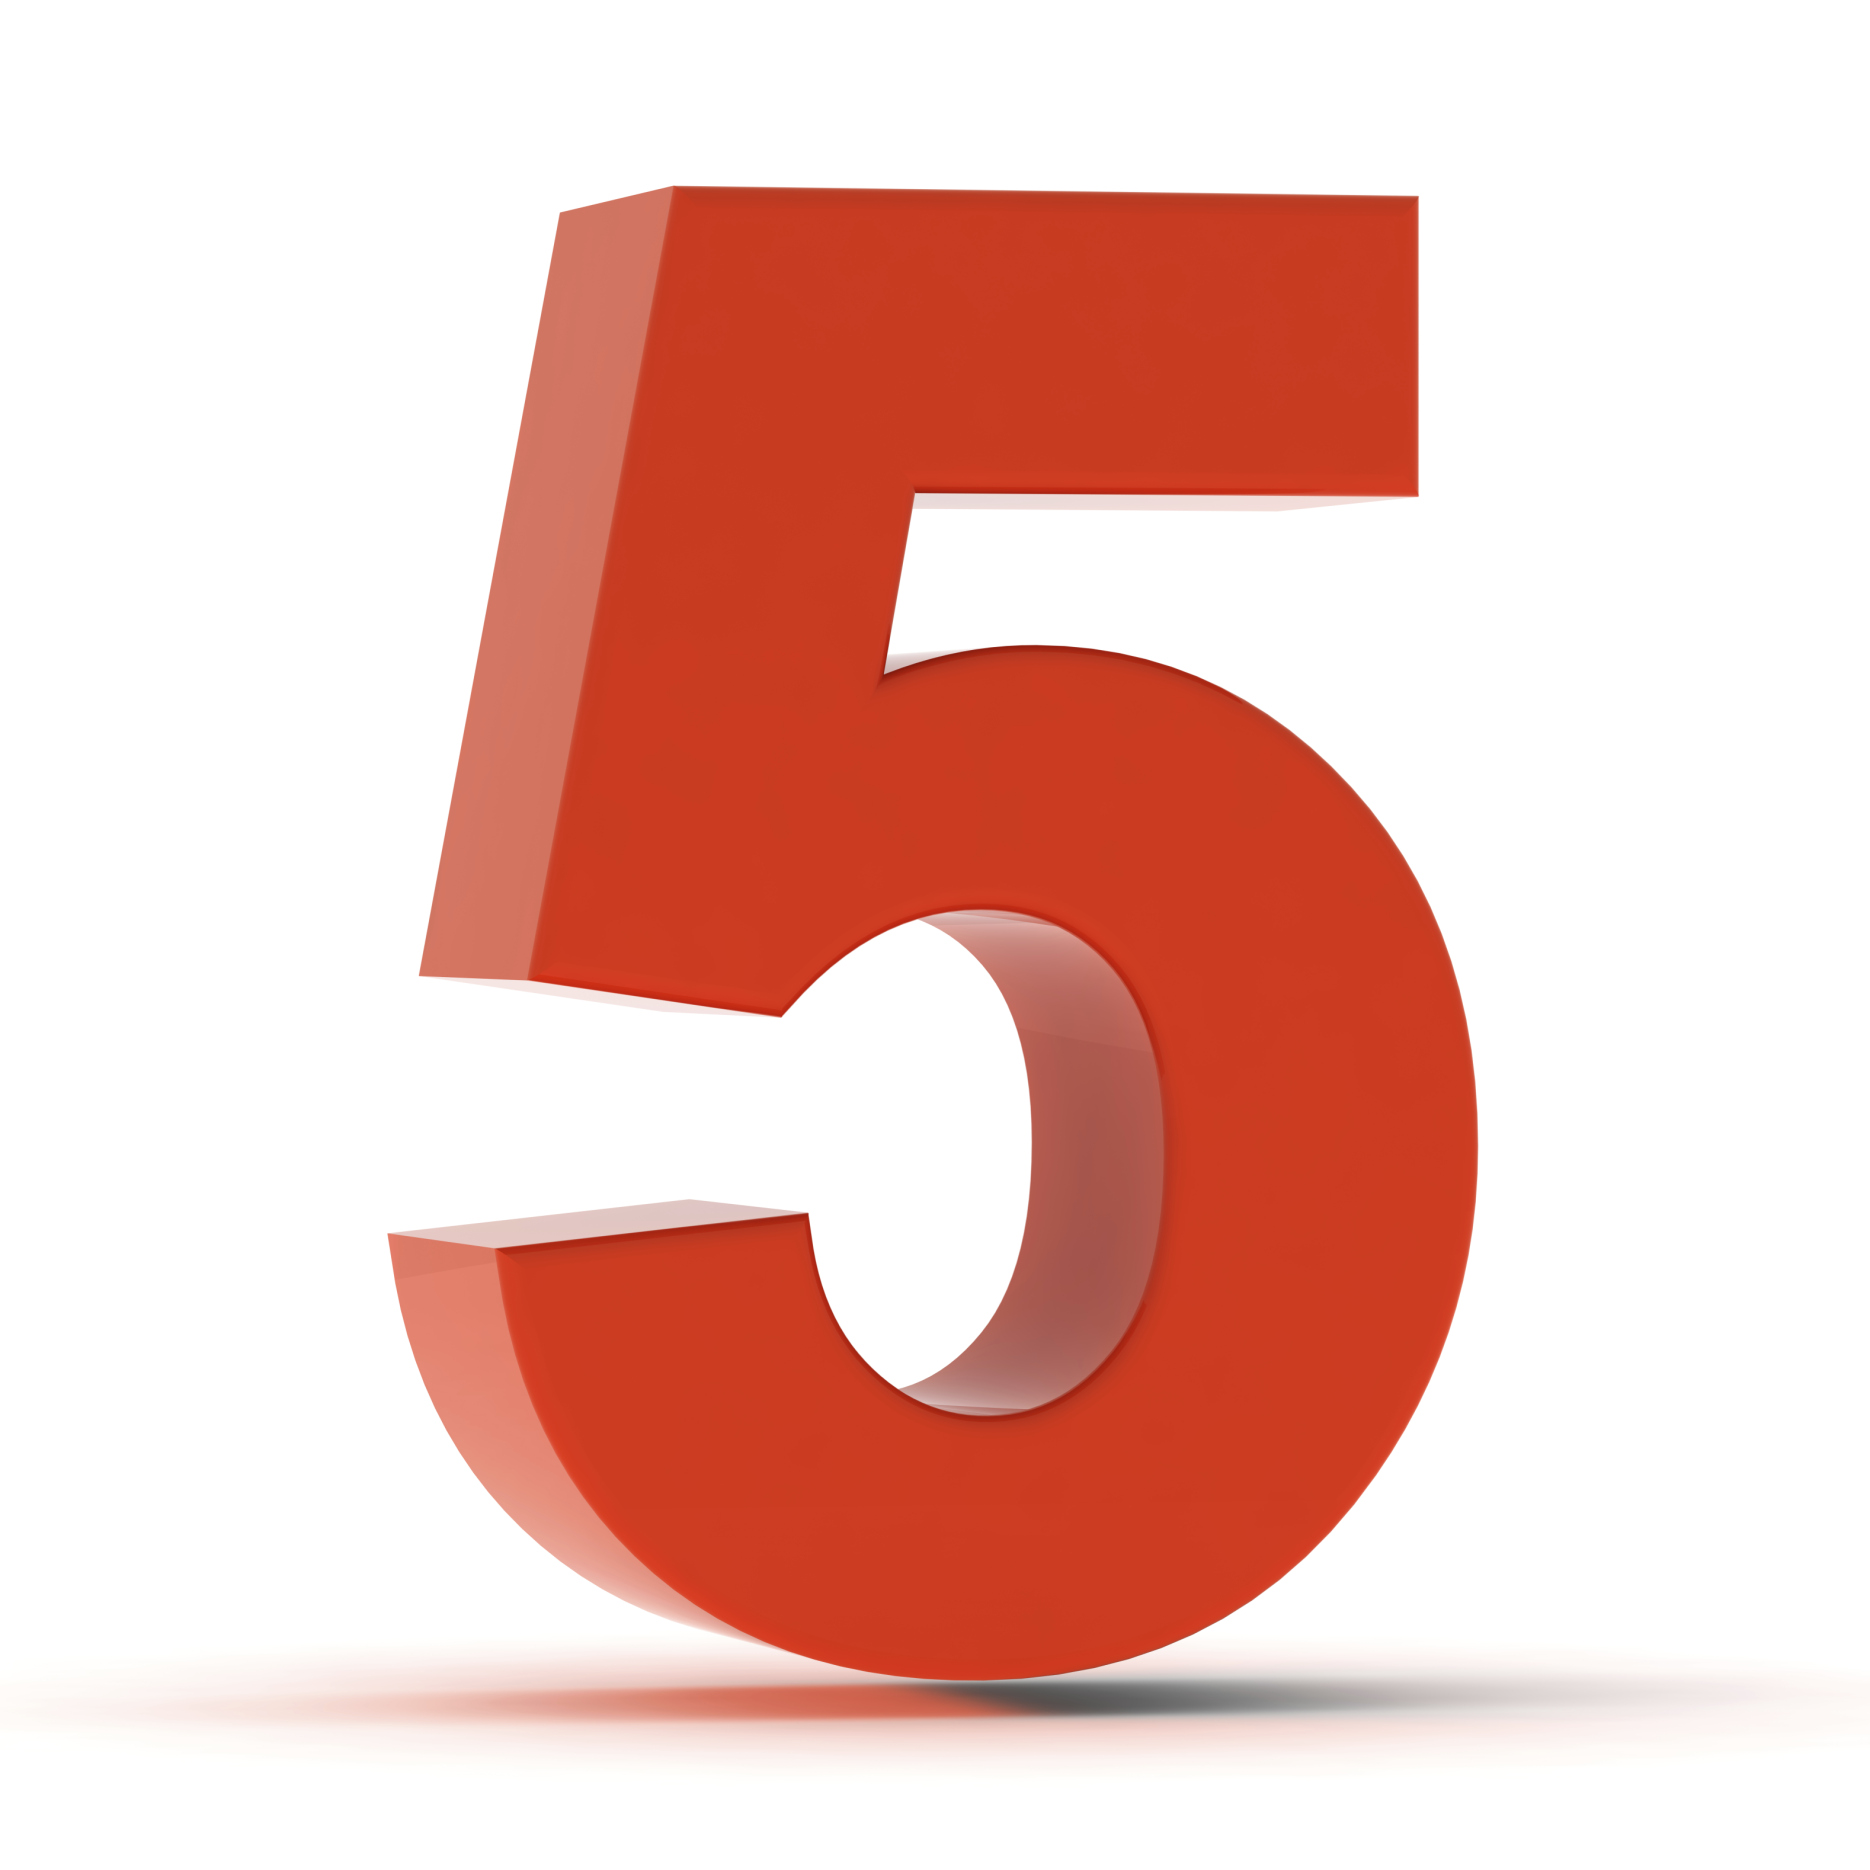 five.jpeg